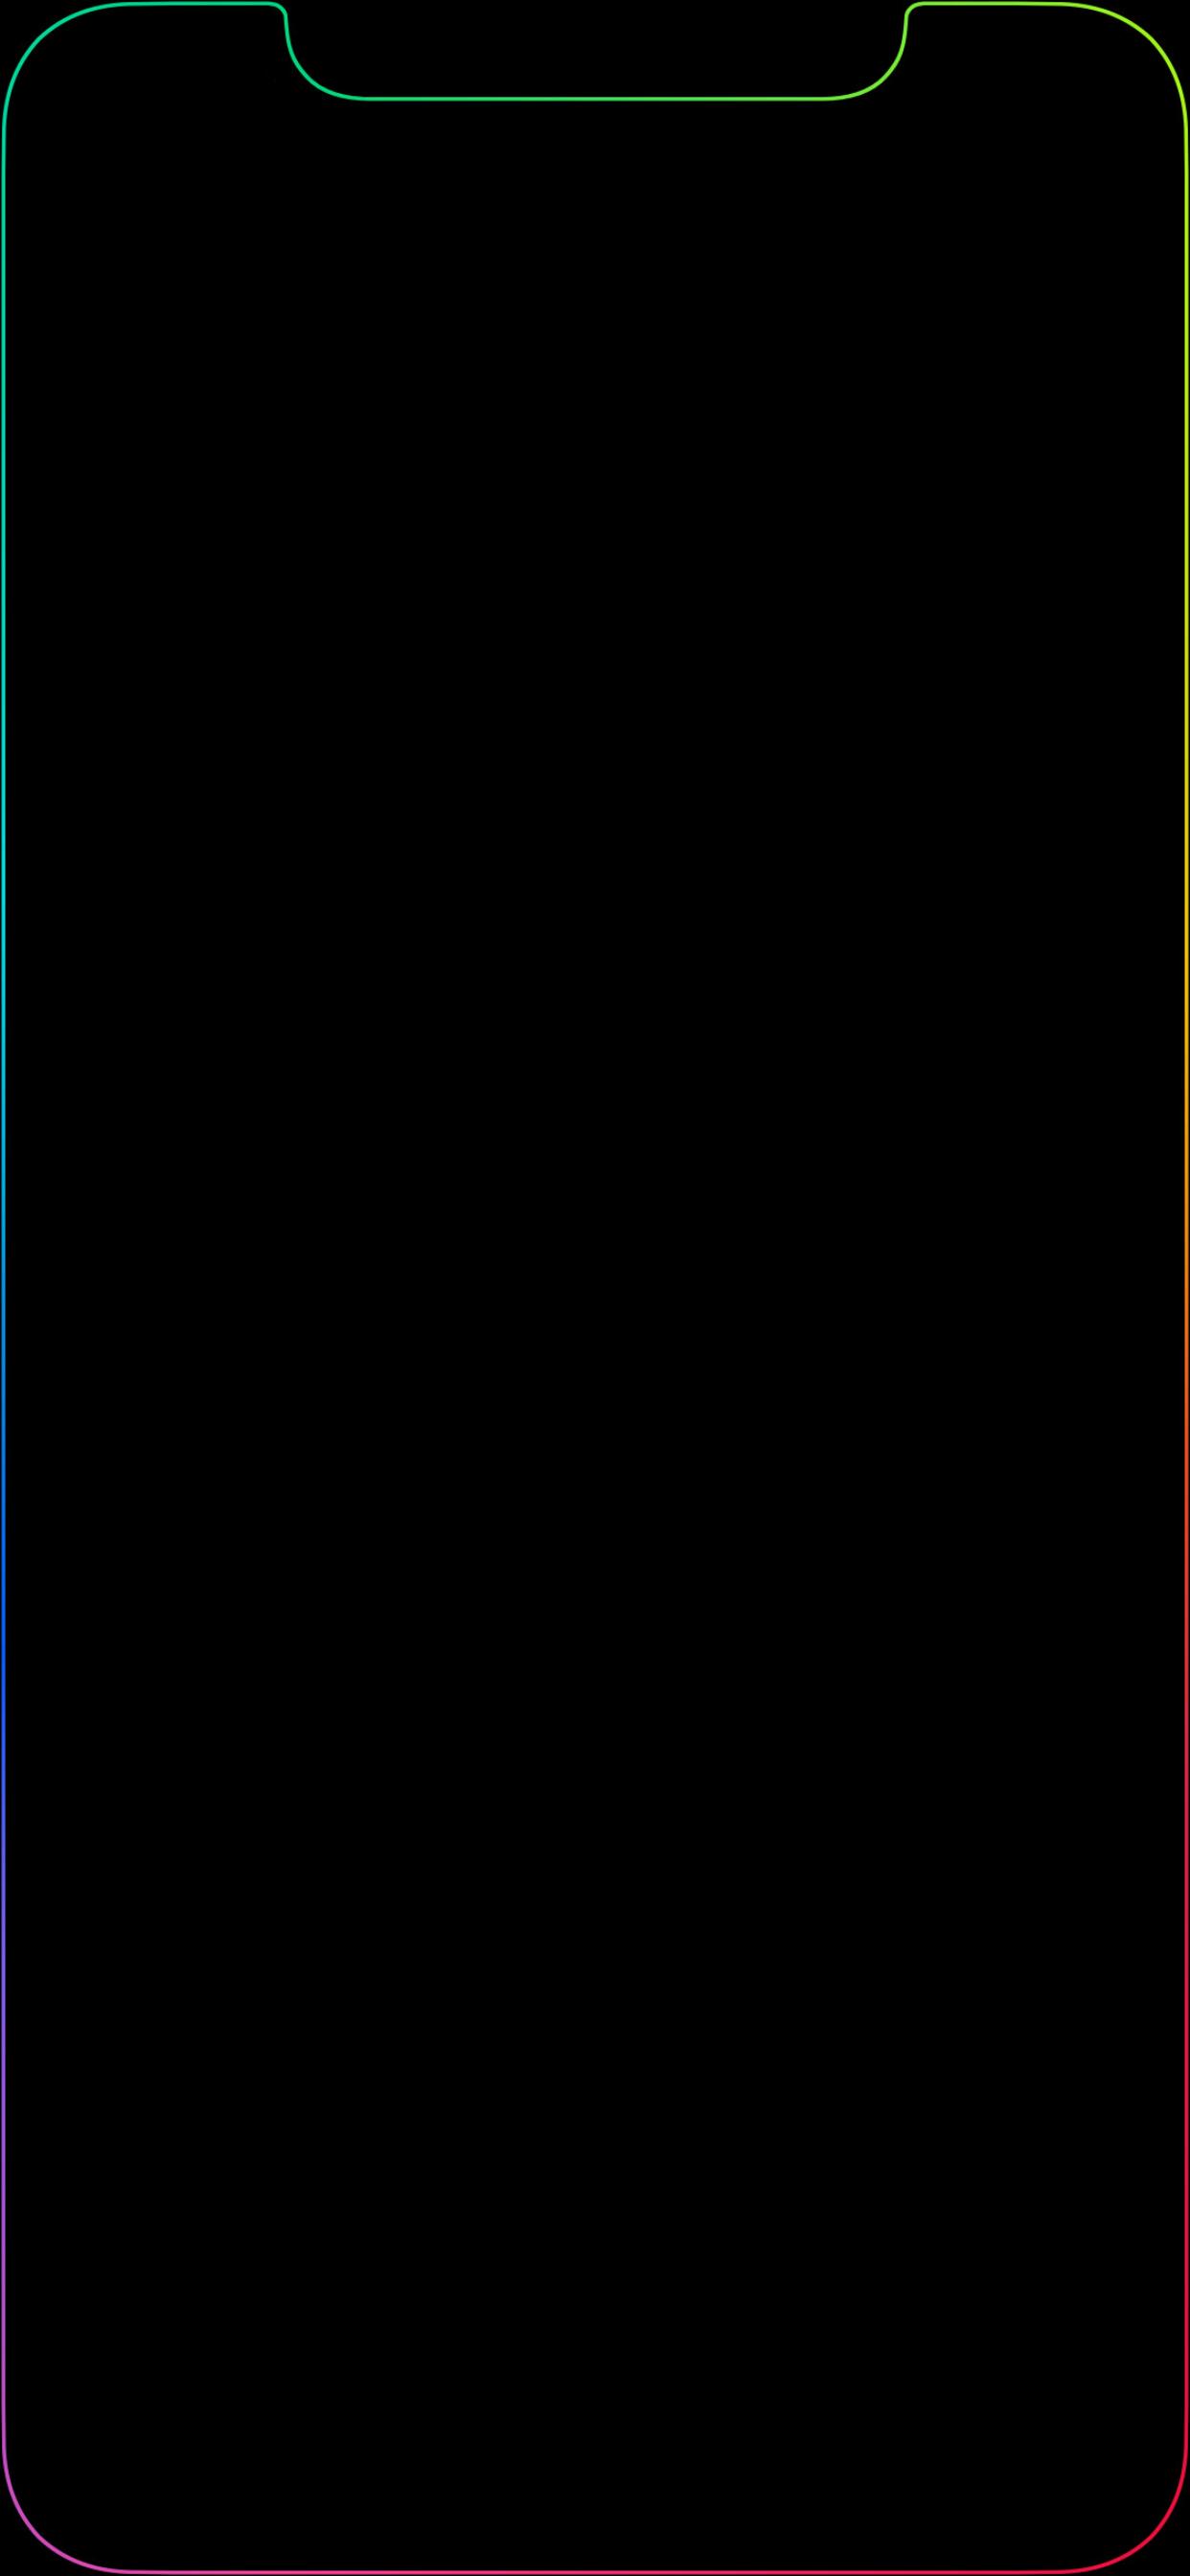 Rainbow Black Wallpaper Posted By Ryan Peltier